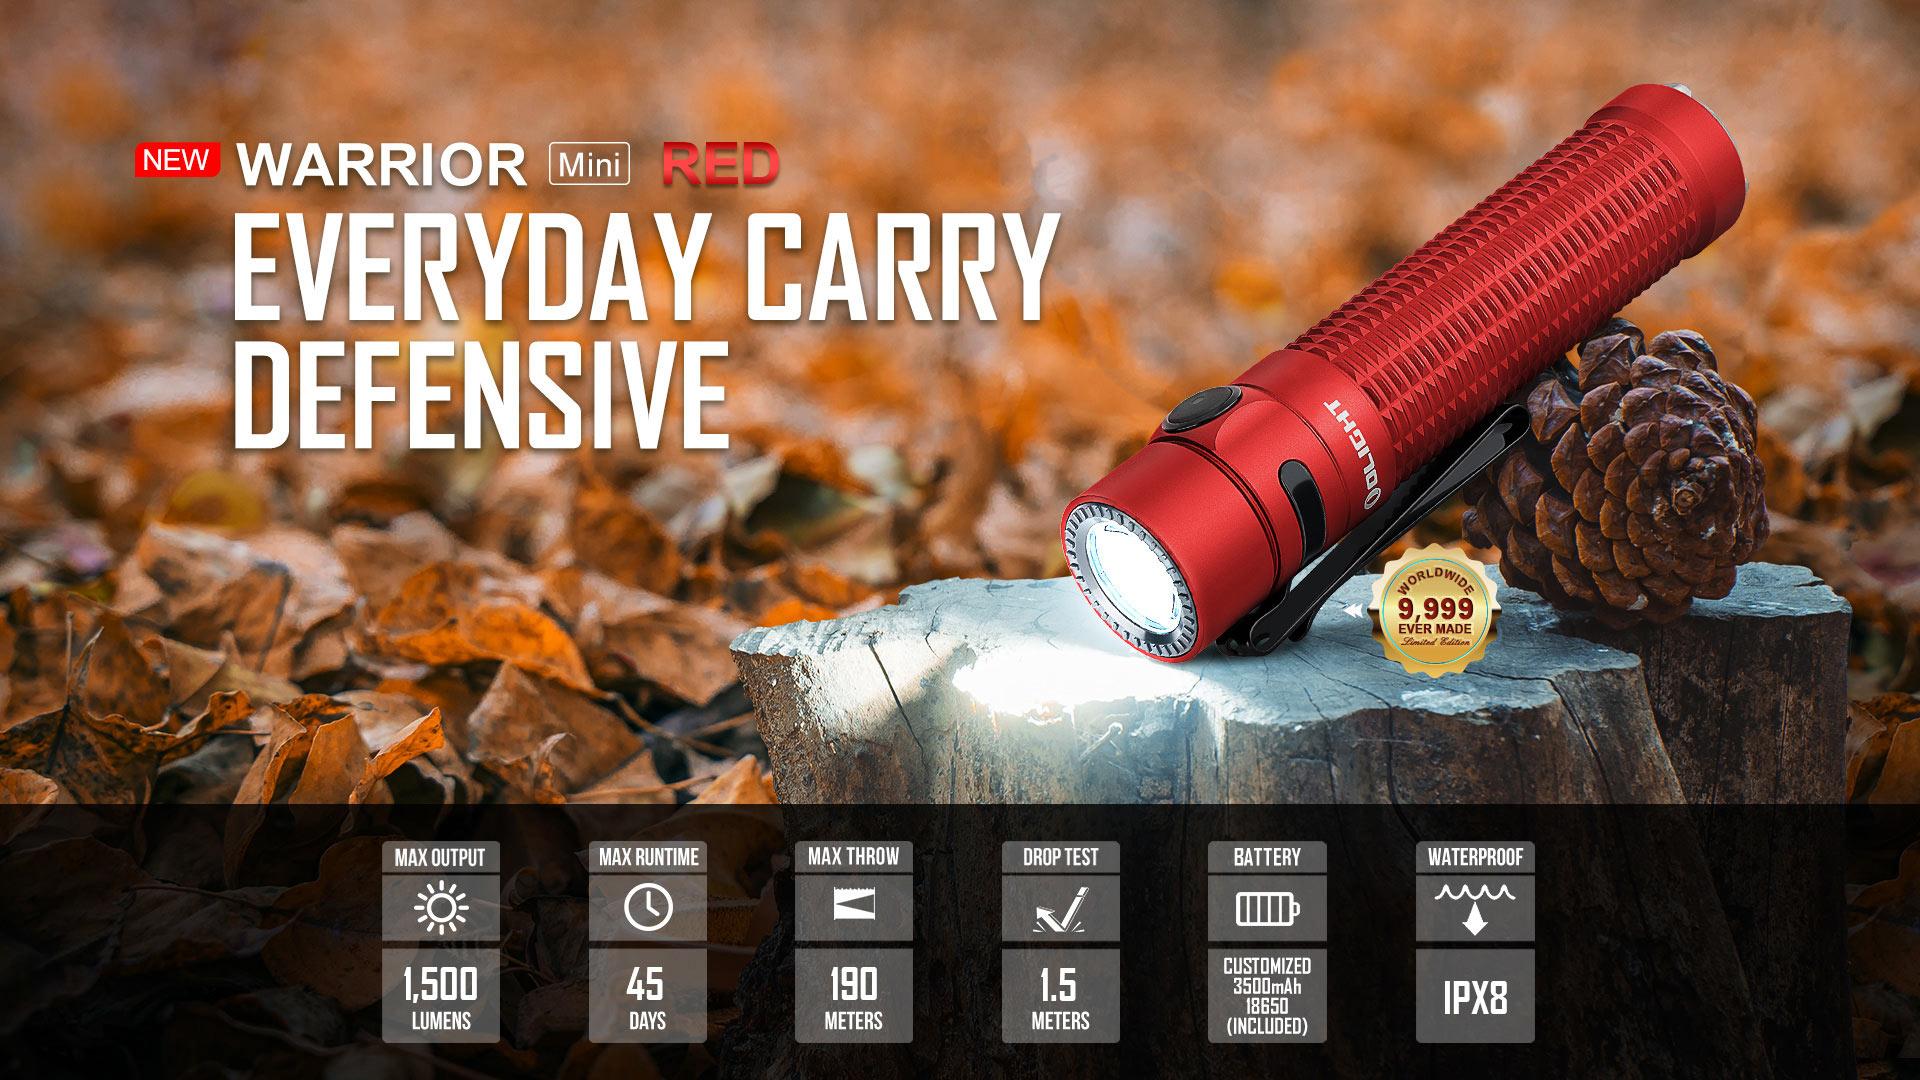 Warrior Mini Red High End EDC Flashlights